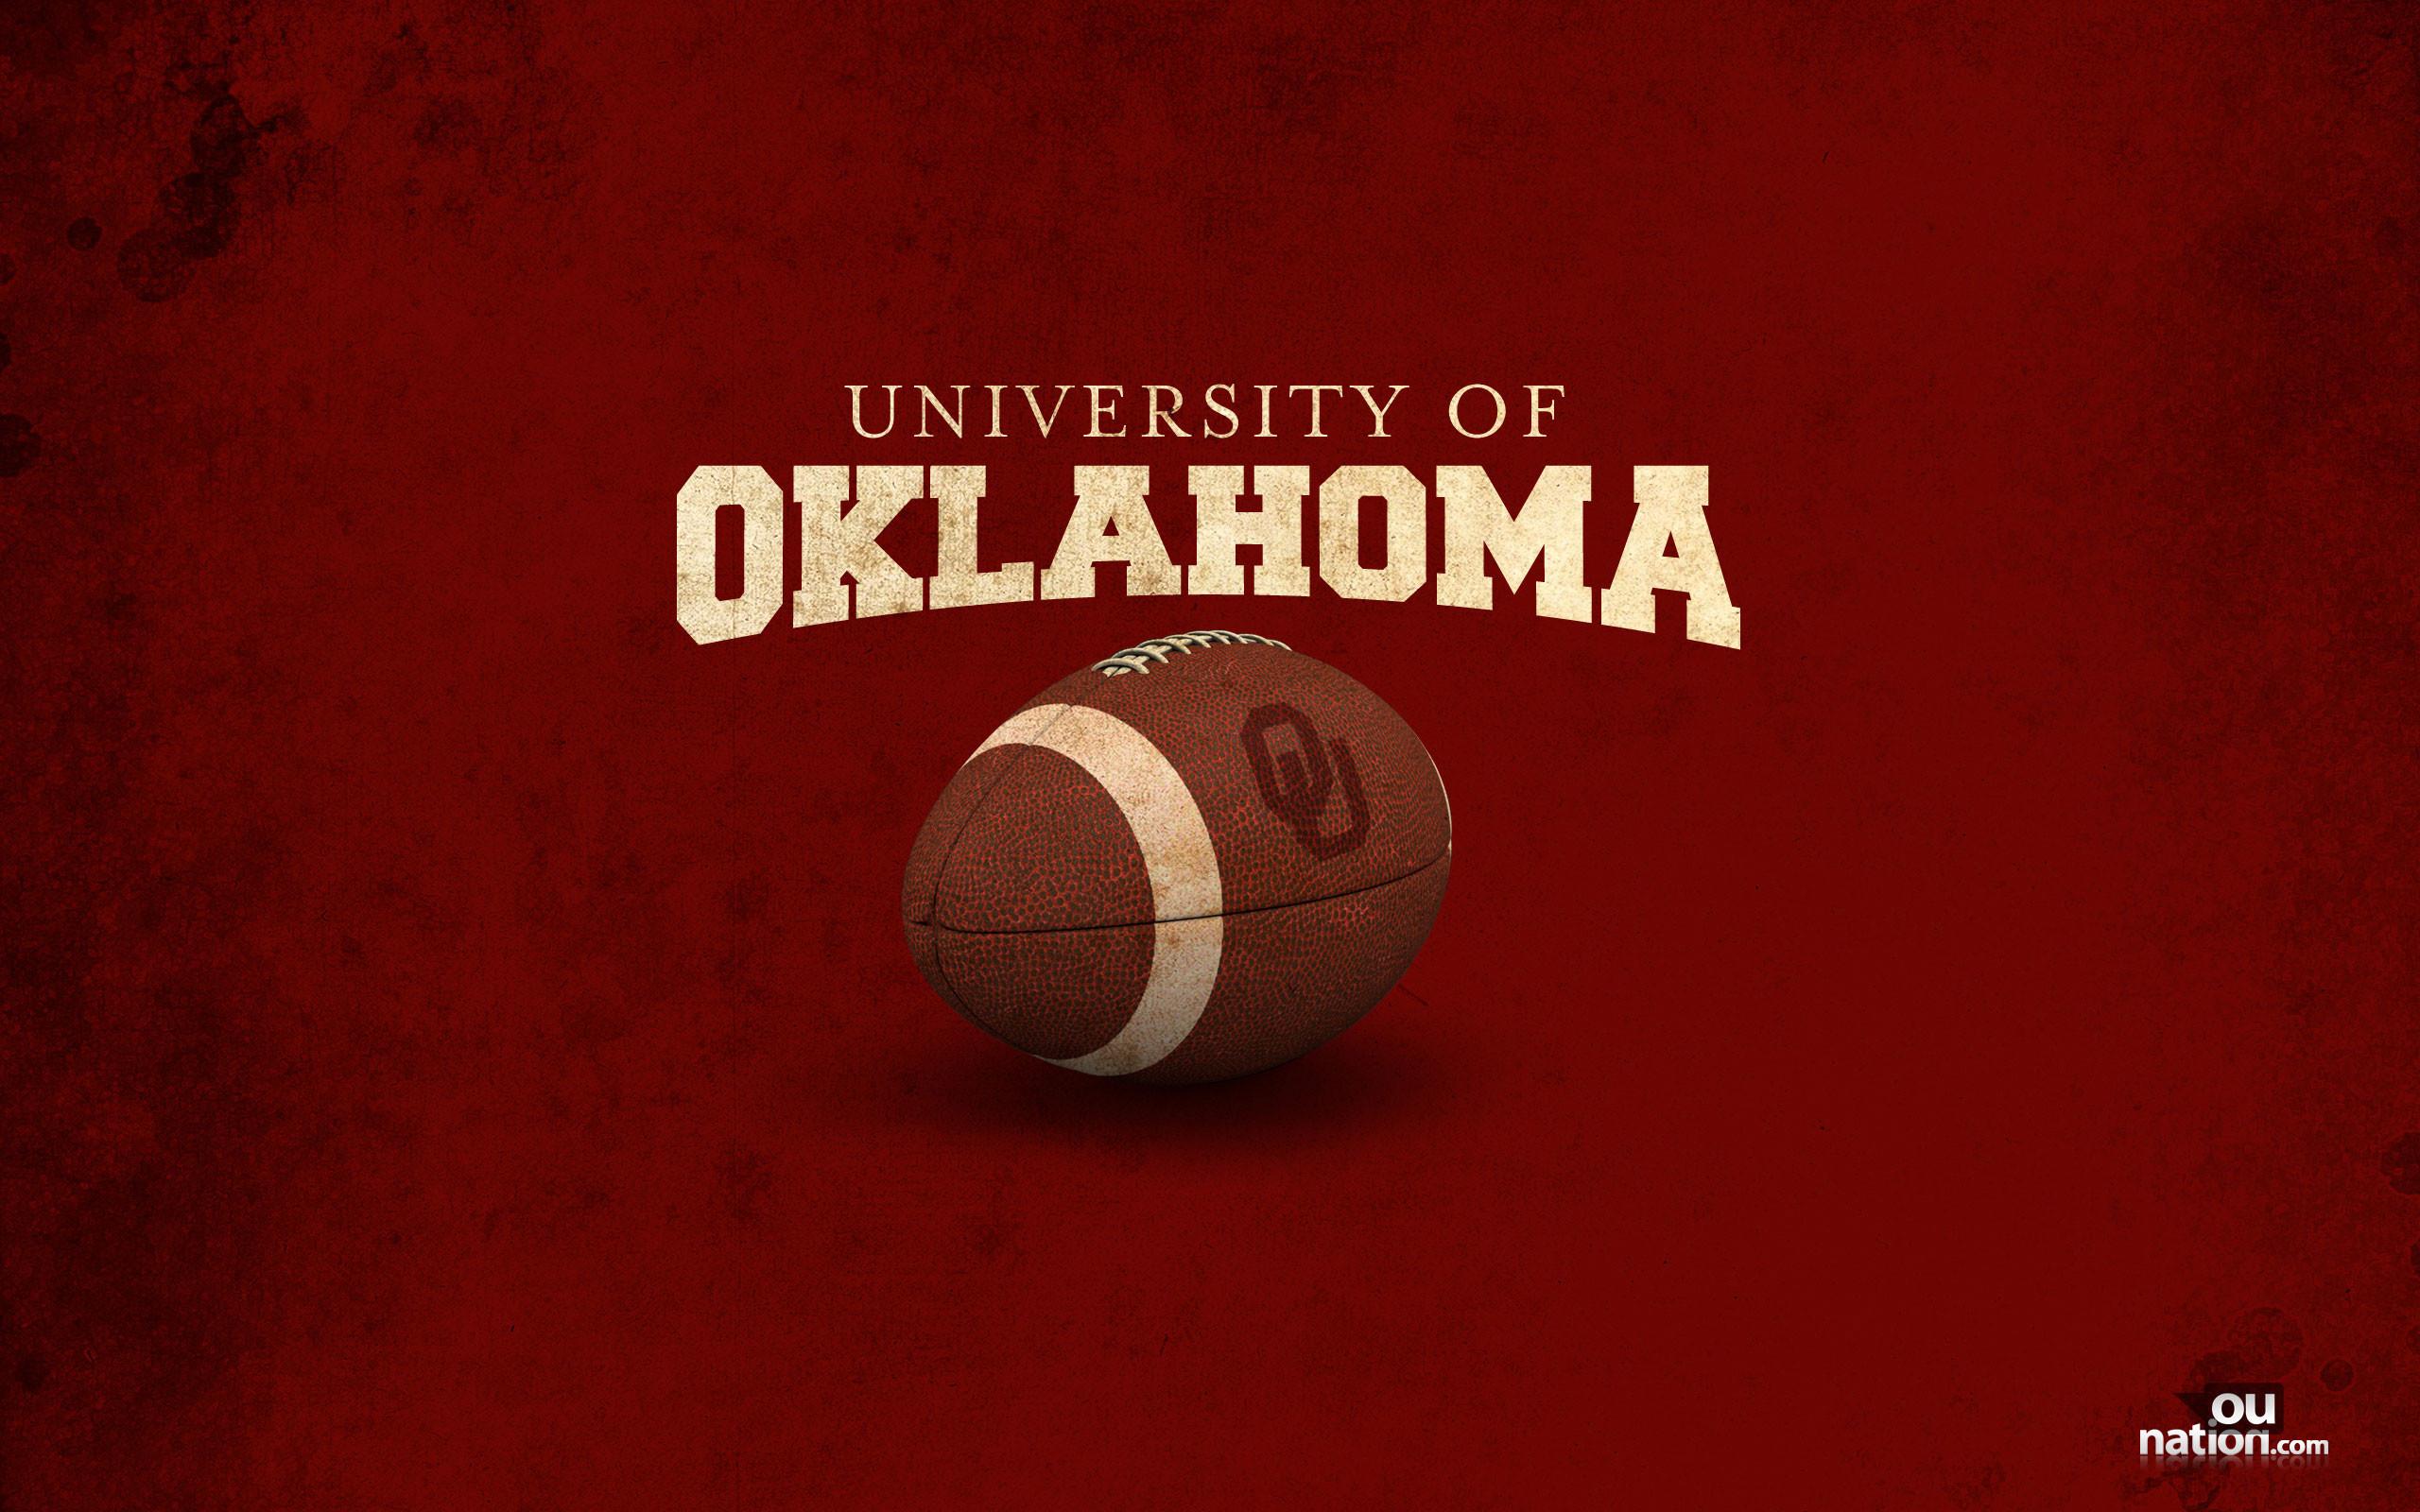 … Sooners Background University of Oklahoma Wallpaper …